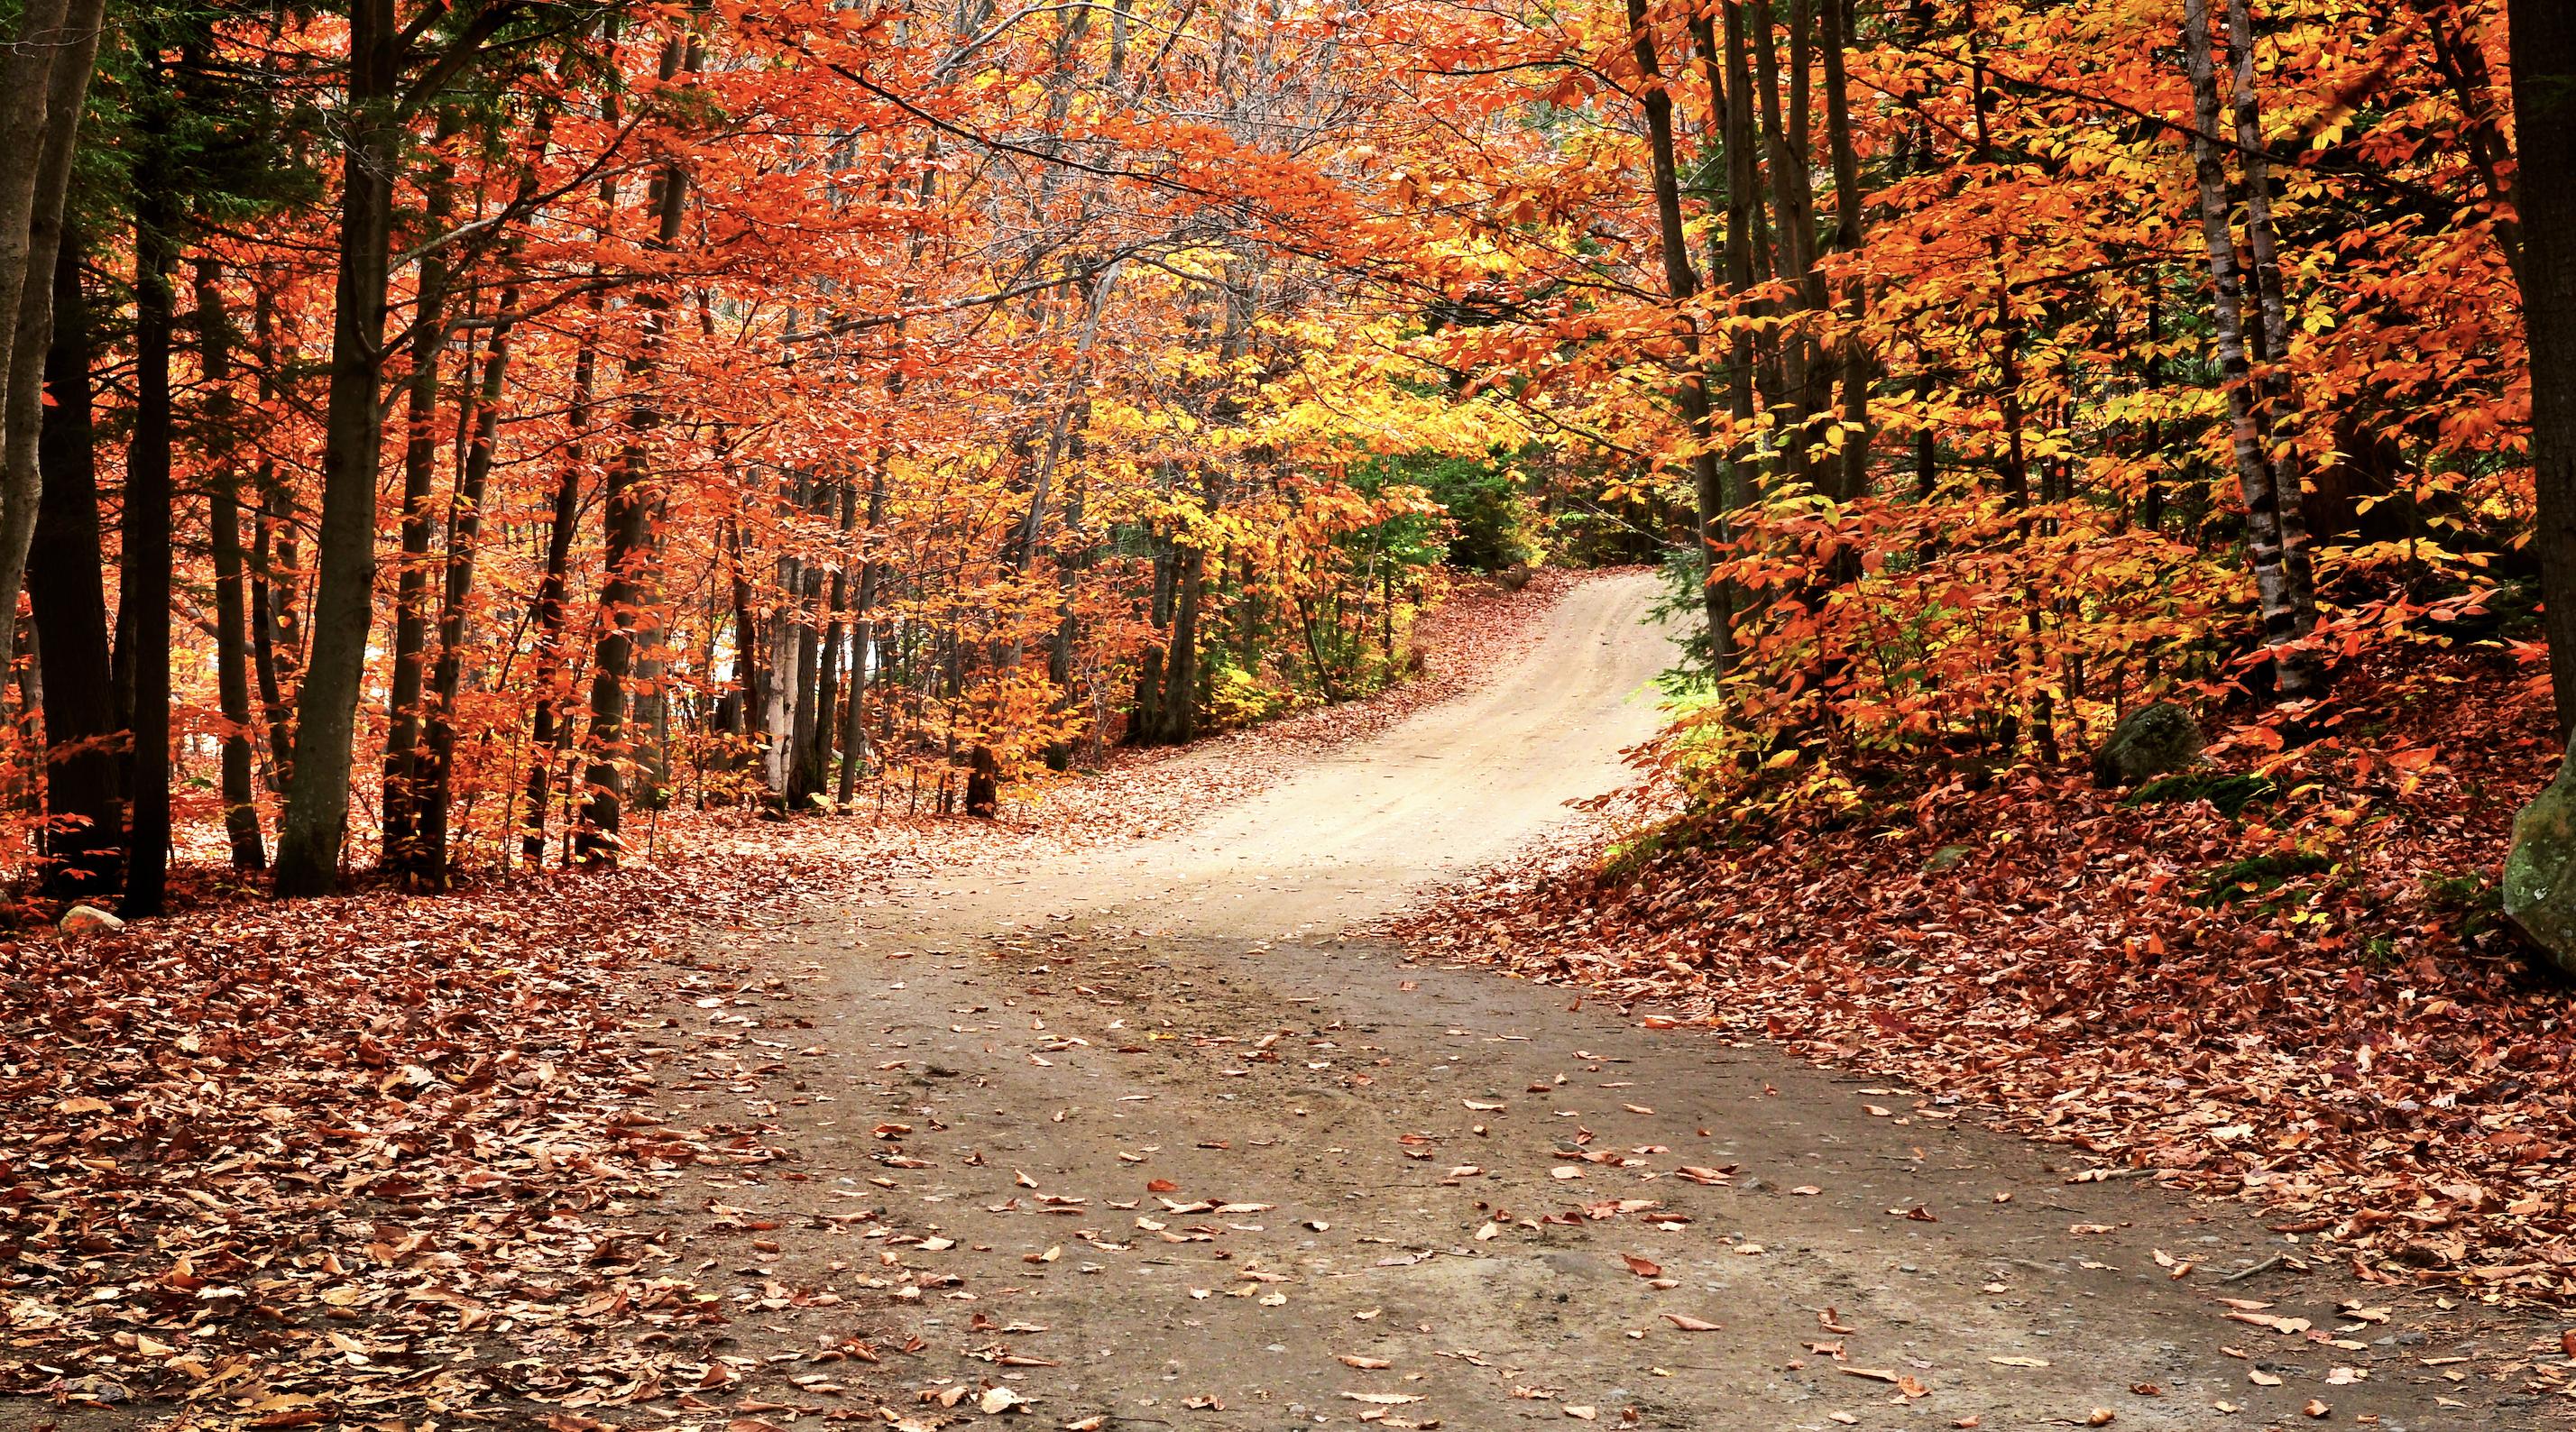 Fall dirt road and S'mores Caramel Popcorn recipe